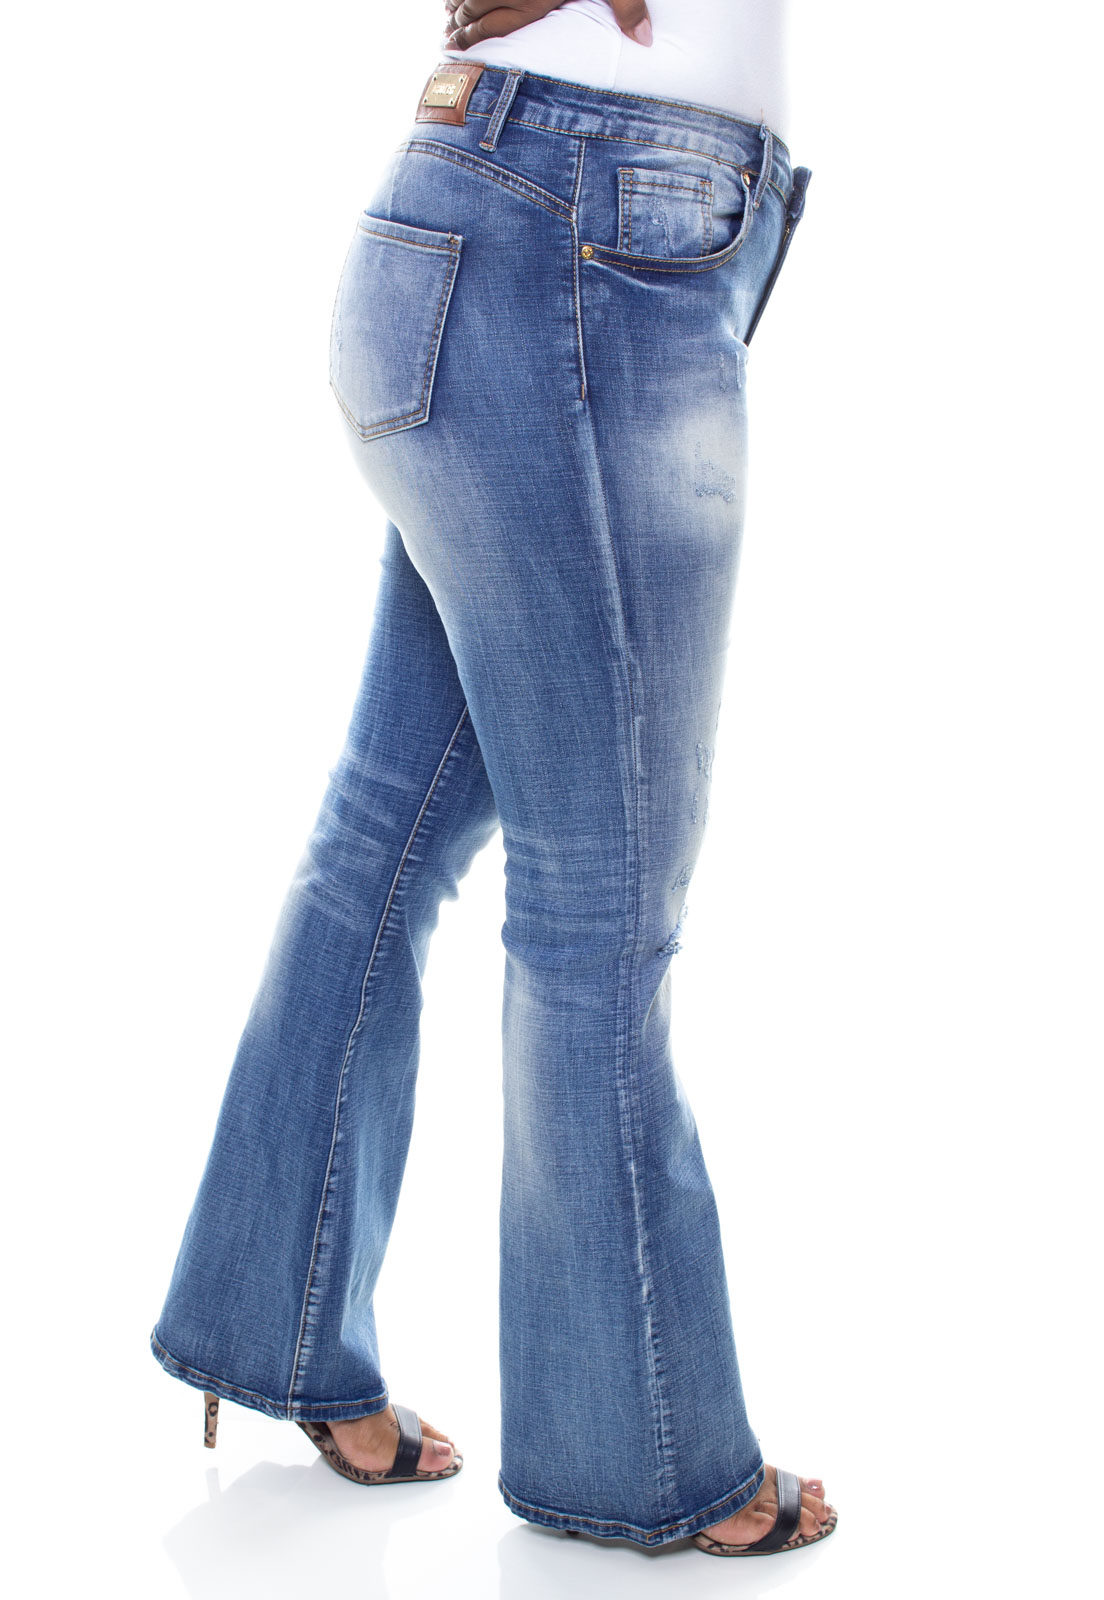 Calça Jeans Feminina Plus Size Flare Crocker - 46407  - CROCKER JEANS